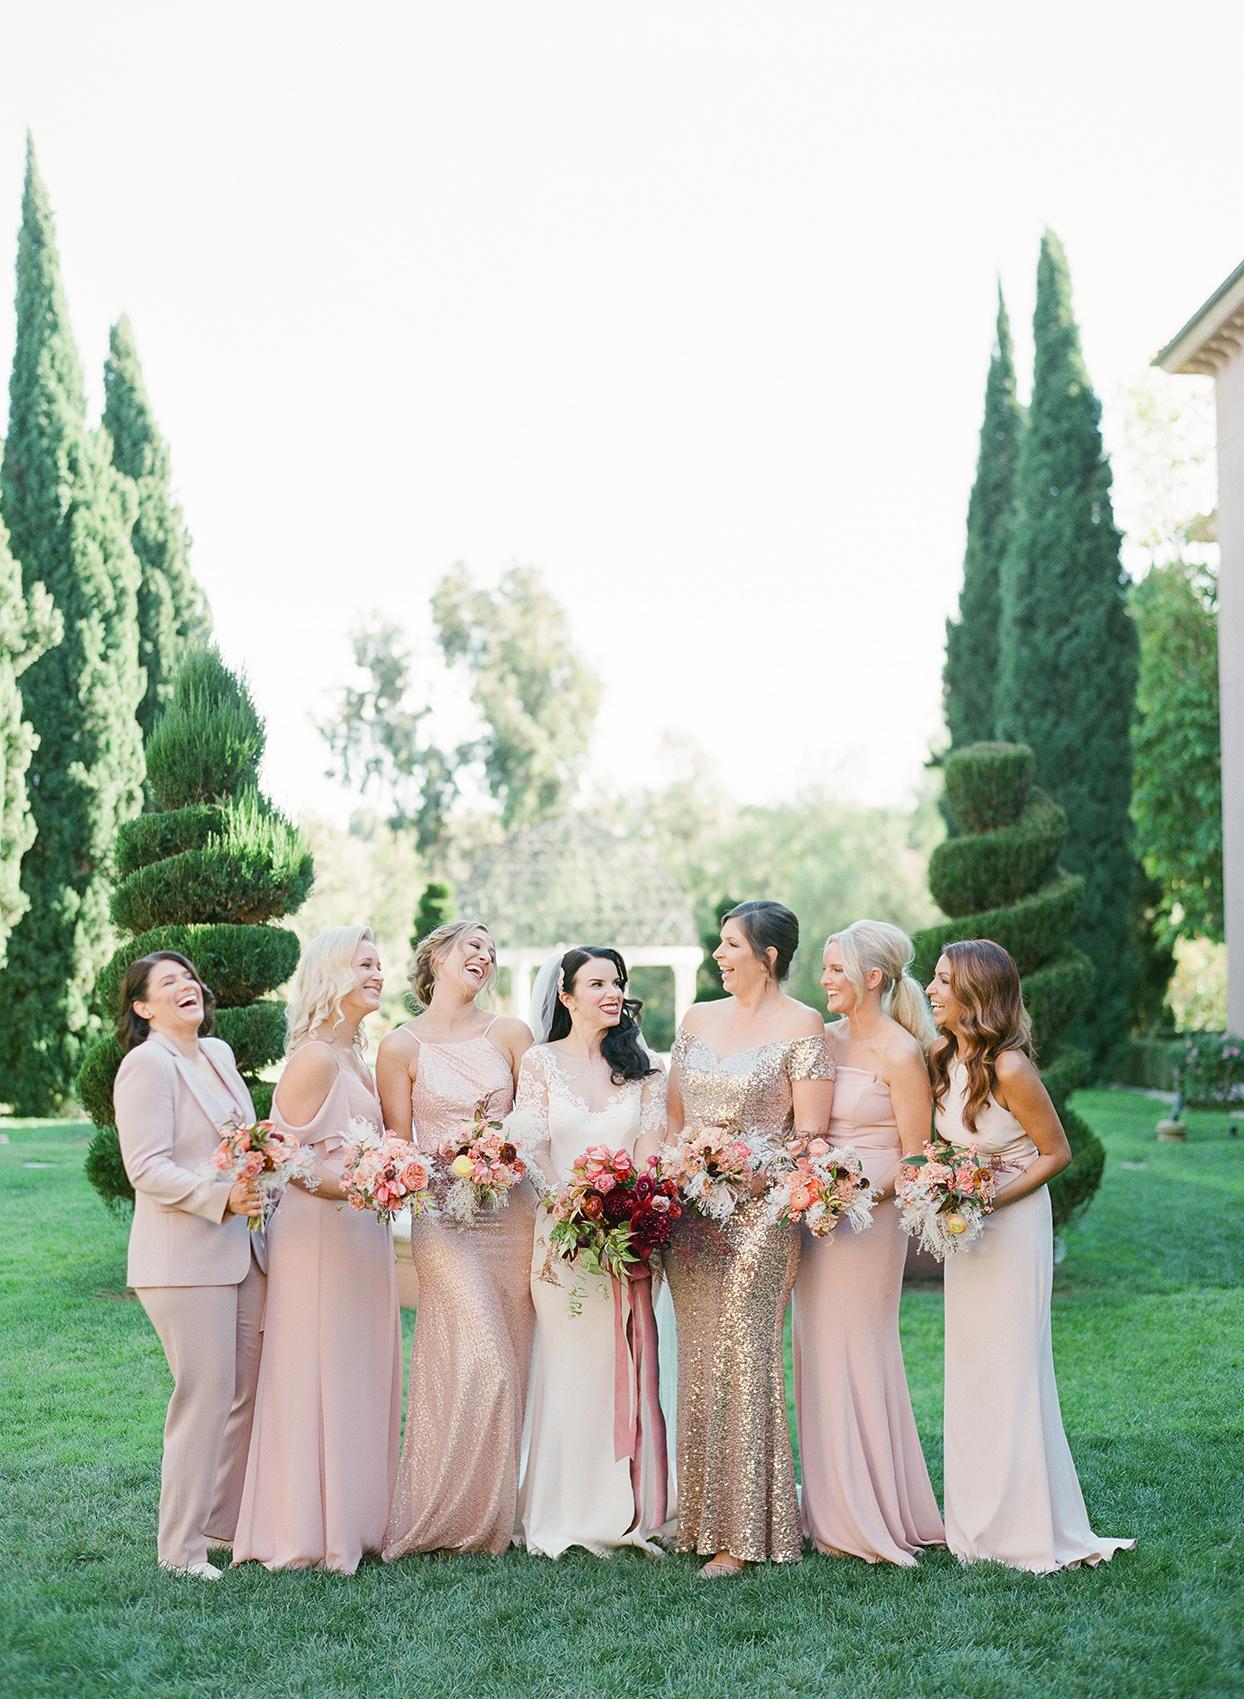 bride and bridesmaids standing in garden in pastel pink dresses